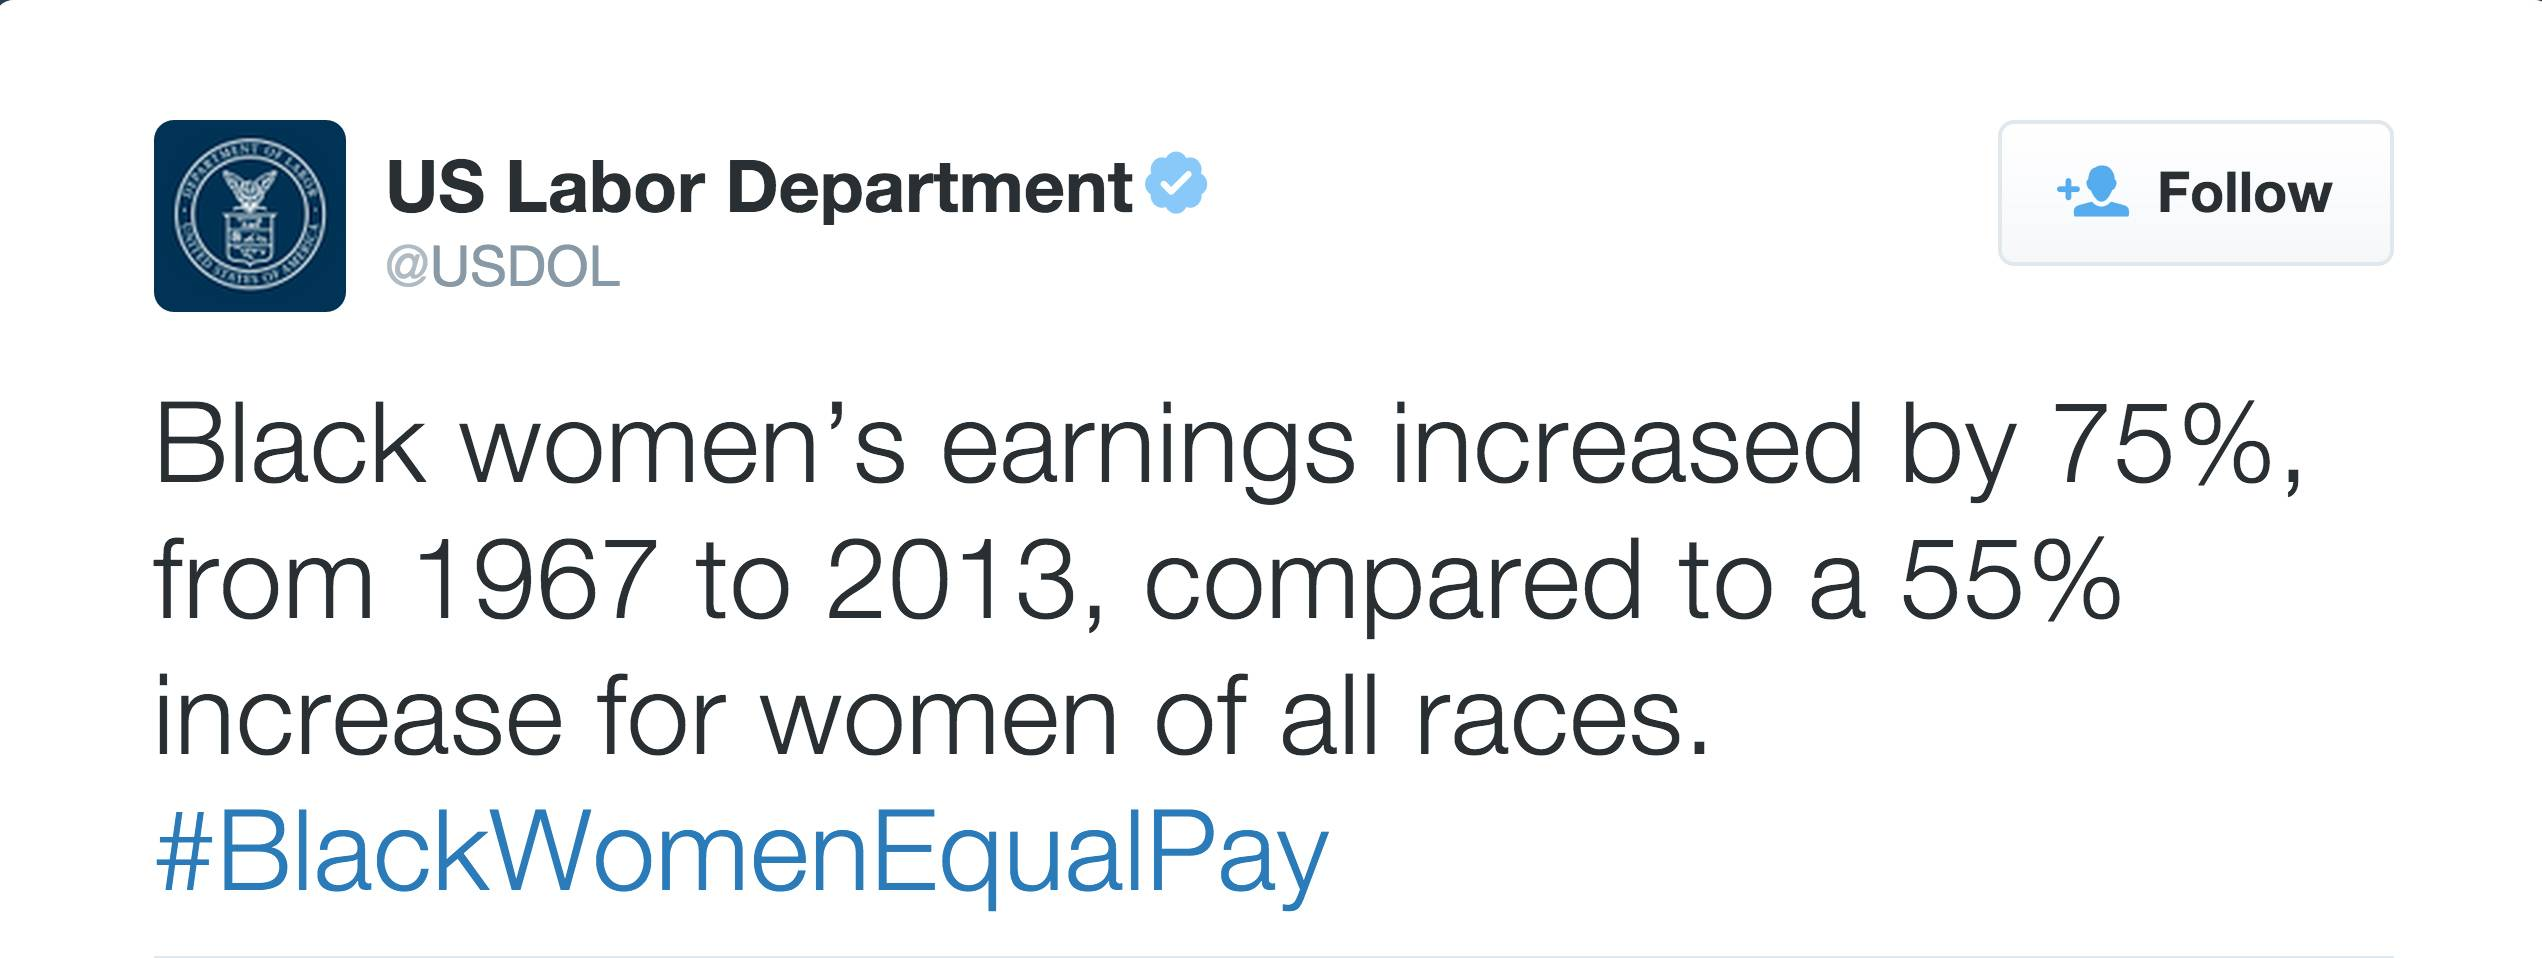 @USDOL - (Photo: US Labor Department via Twitter)